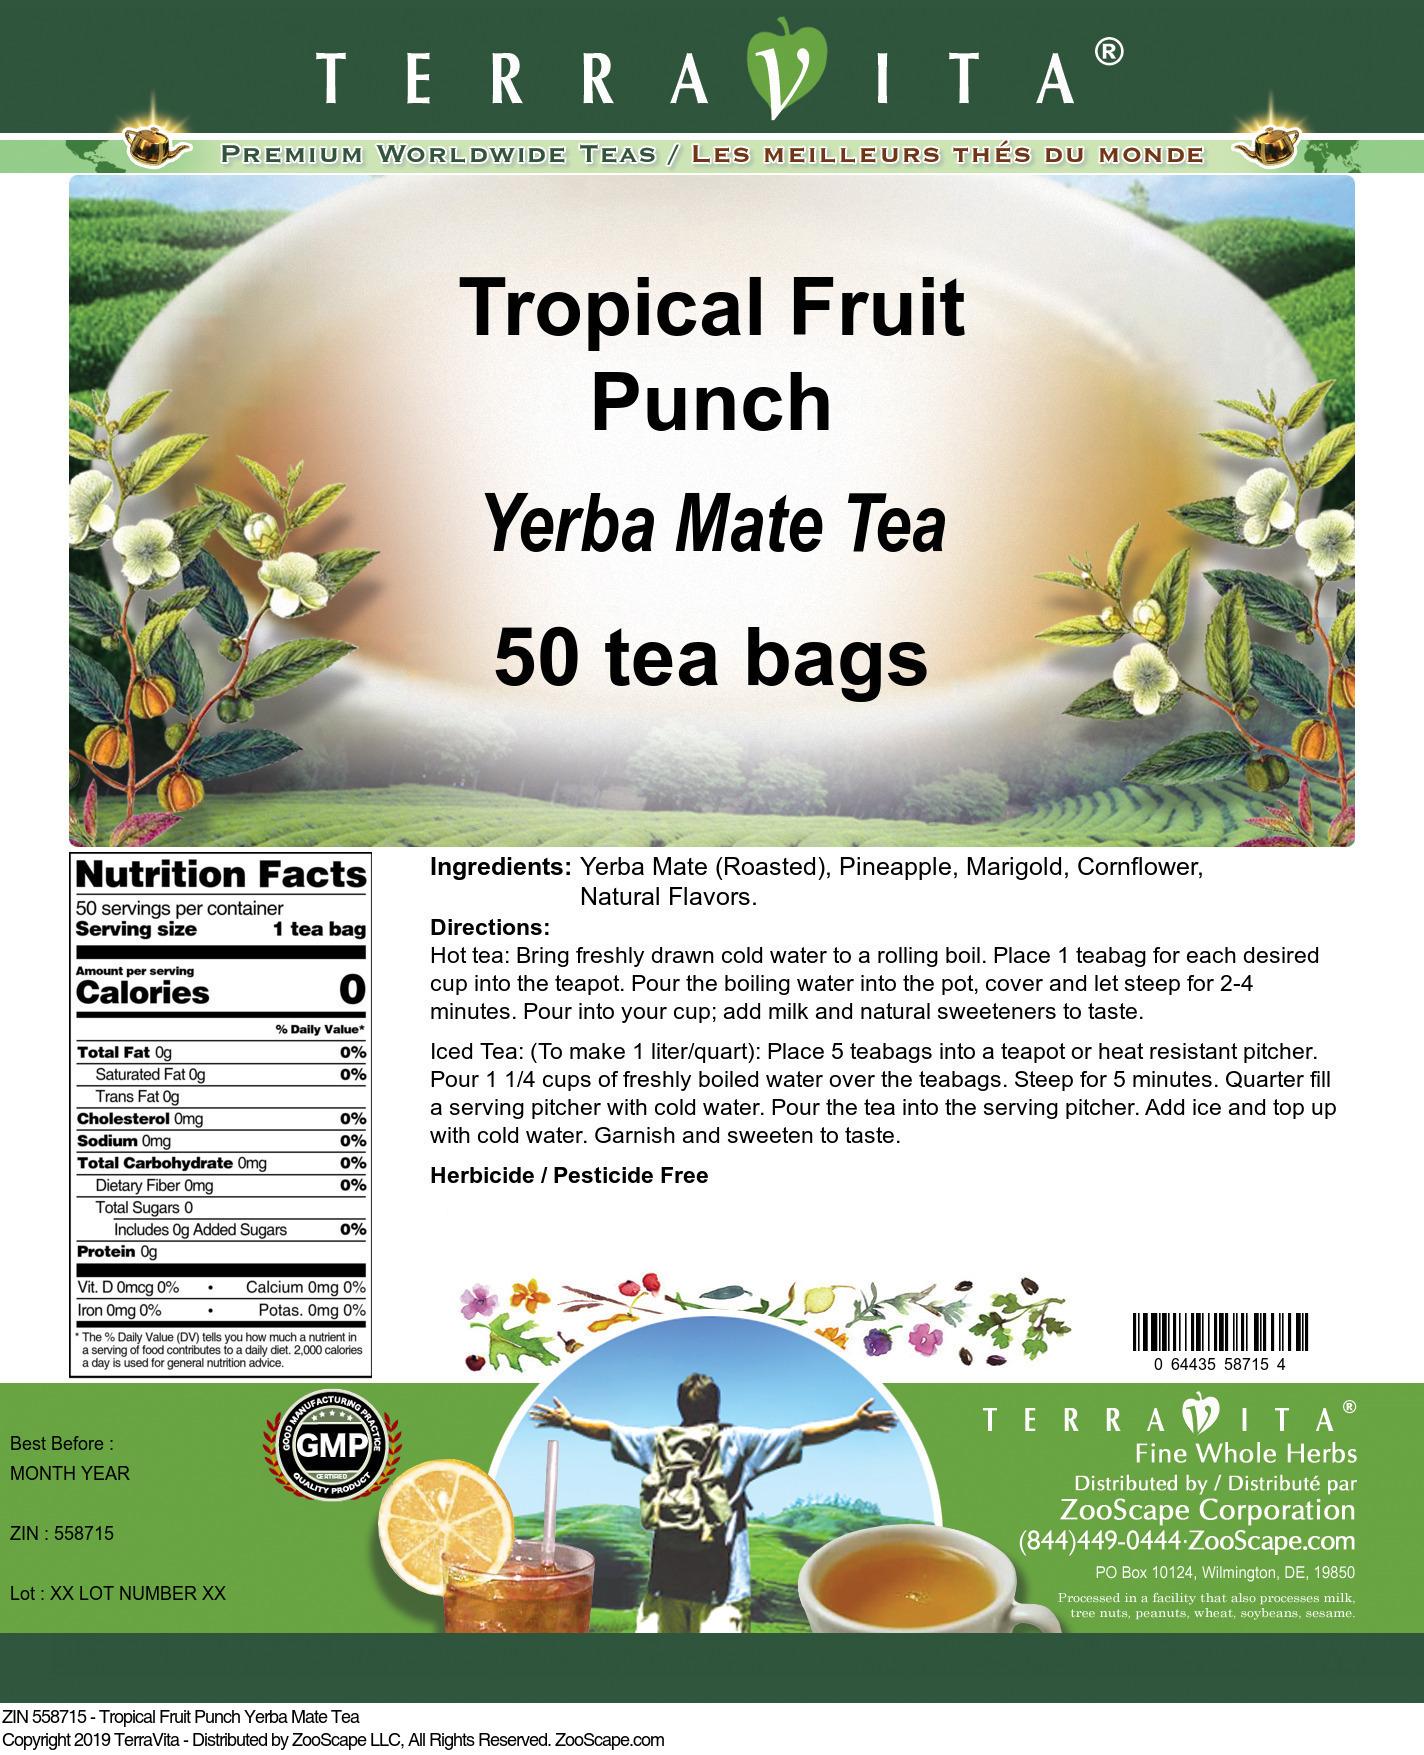 Tropical Fruit Punch Yerba Mate Tea